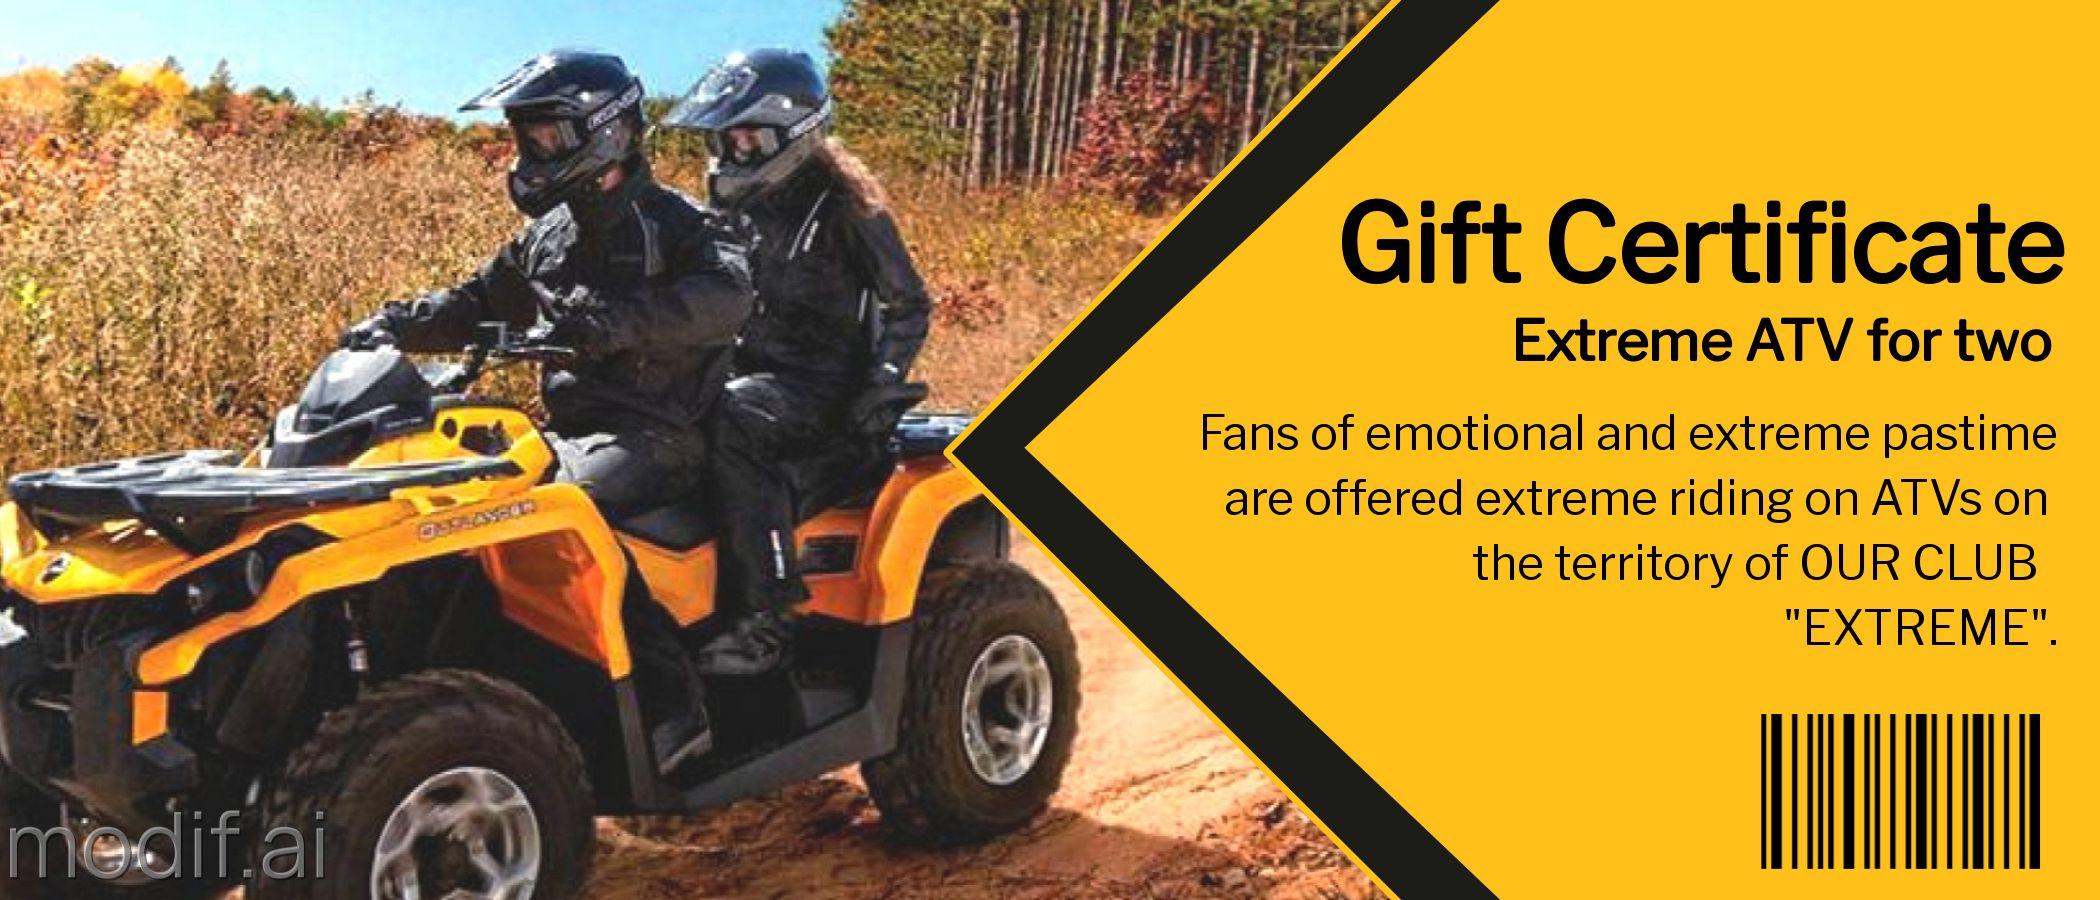 Extreme ATV Gift Certificate Design